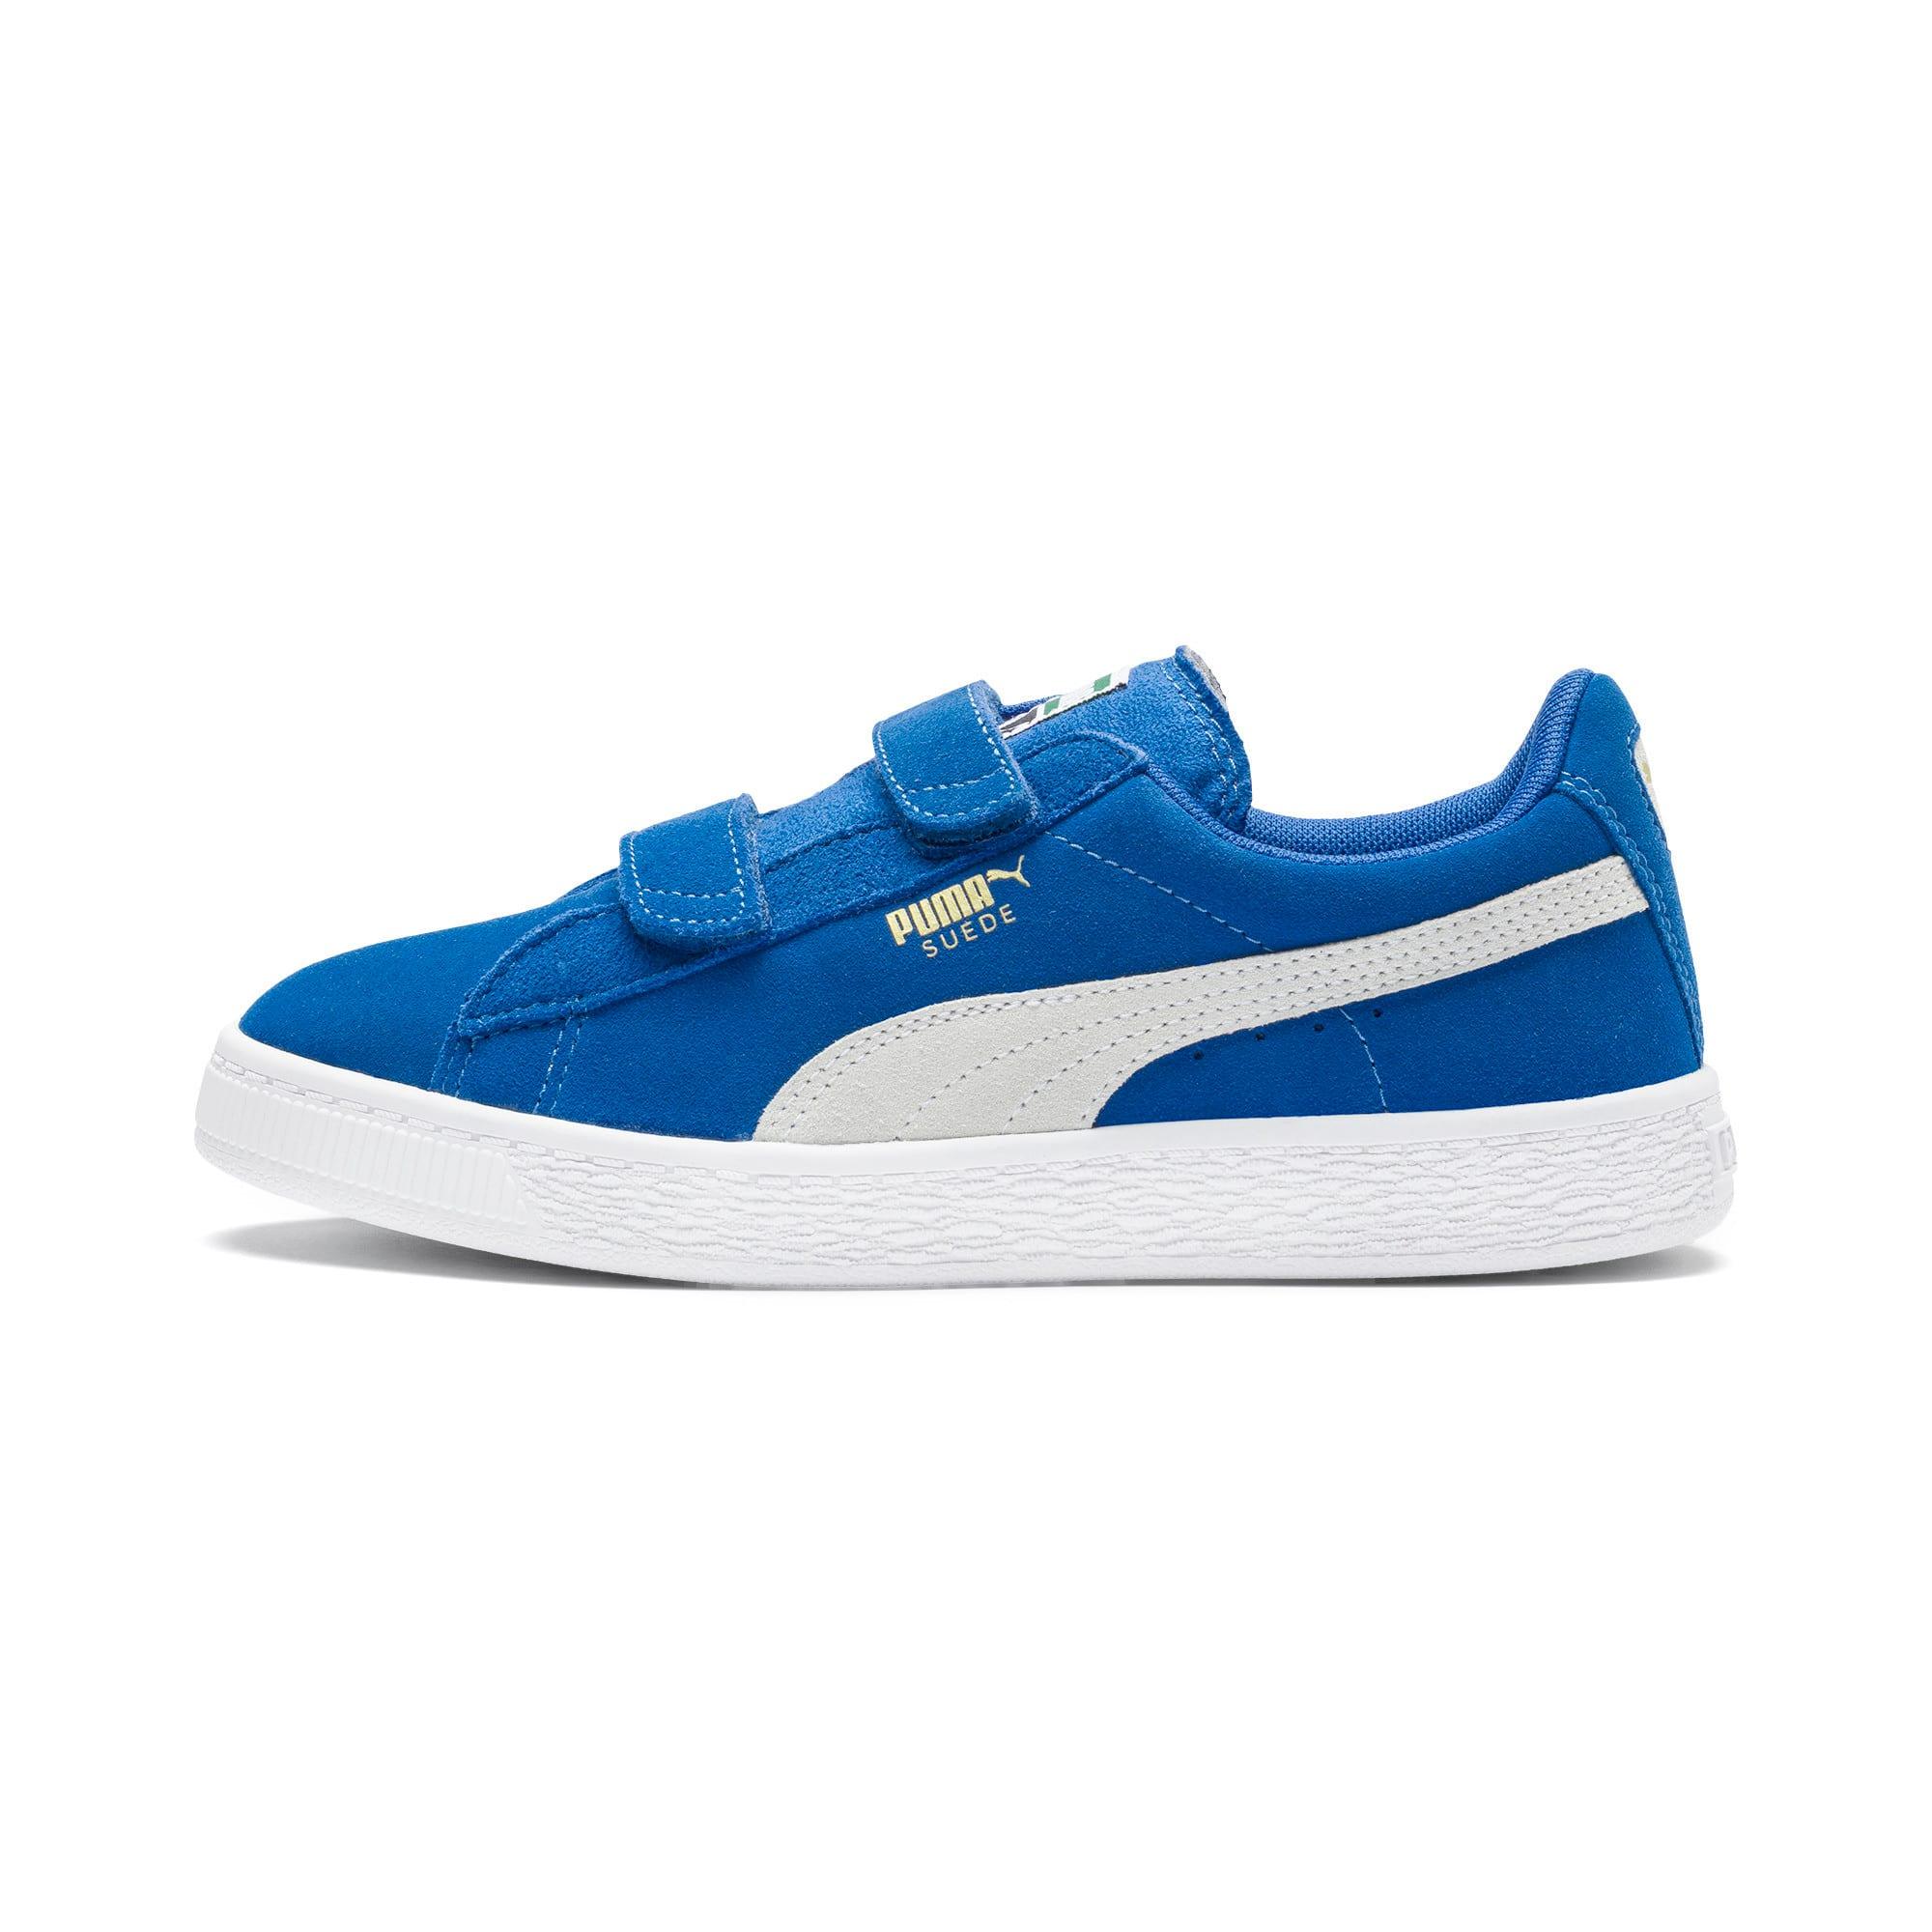 Thumbnail 1 of Suede Preschool Sneaker mit 2 Riemen, Snorkel Blue-Puma White, medium